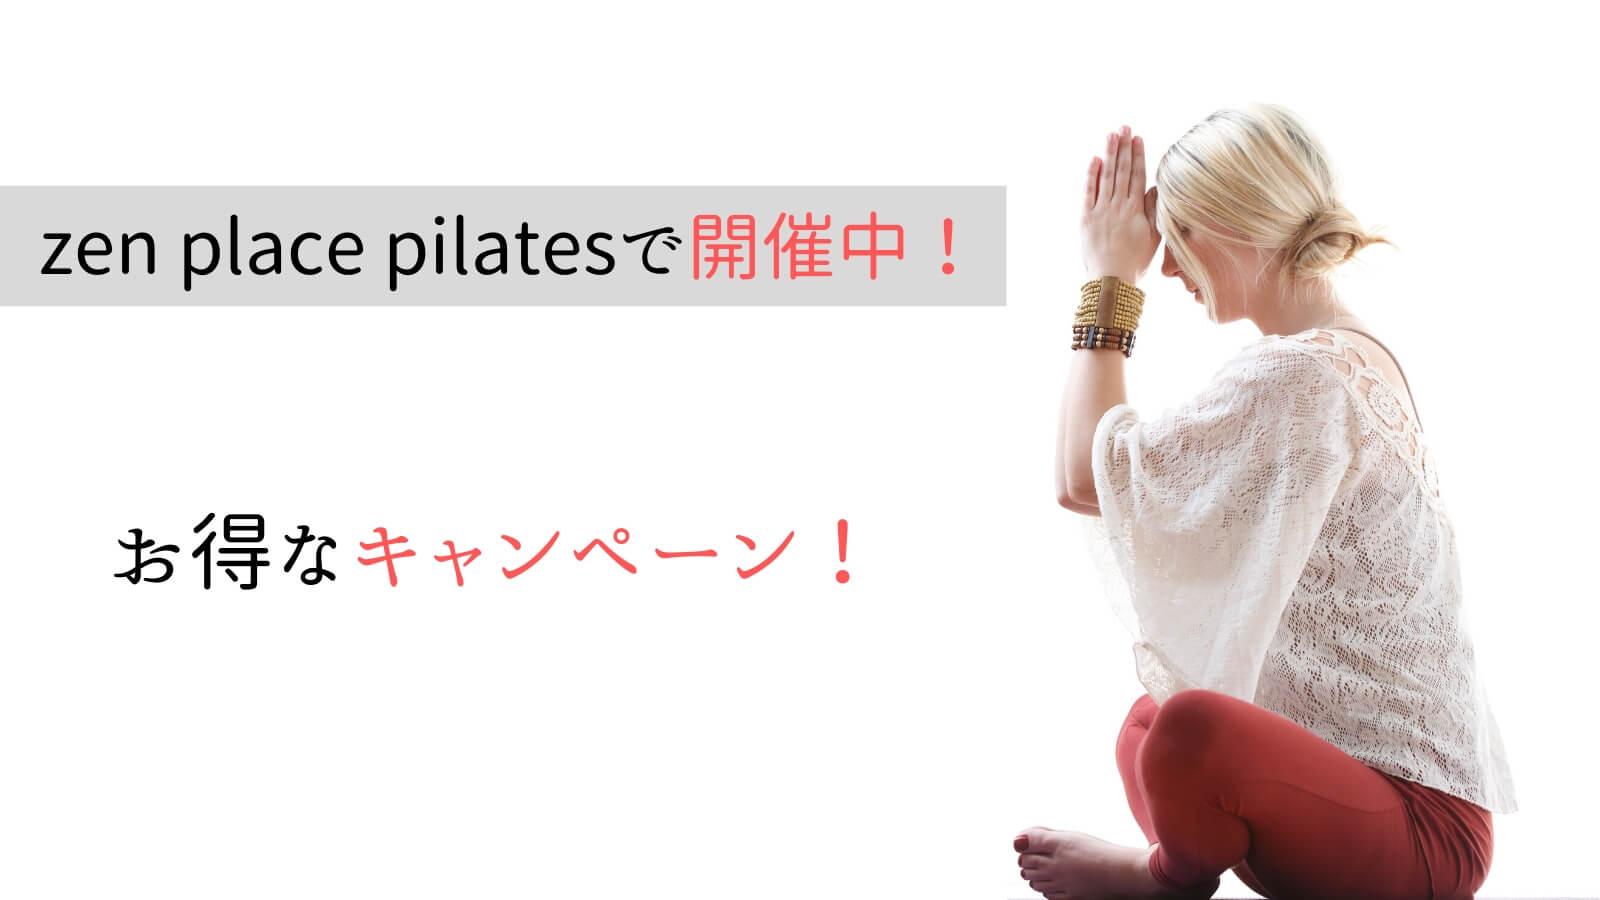 zen place pilates(ゼンプレイスピラティス)で開催中のお得なキャンペーン